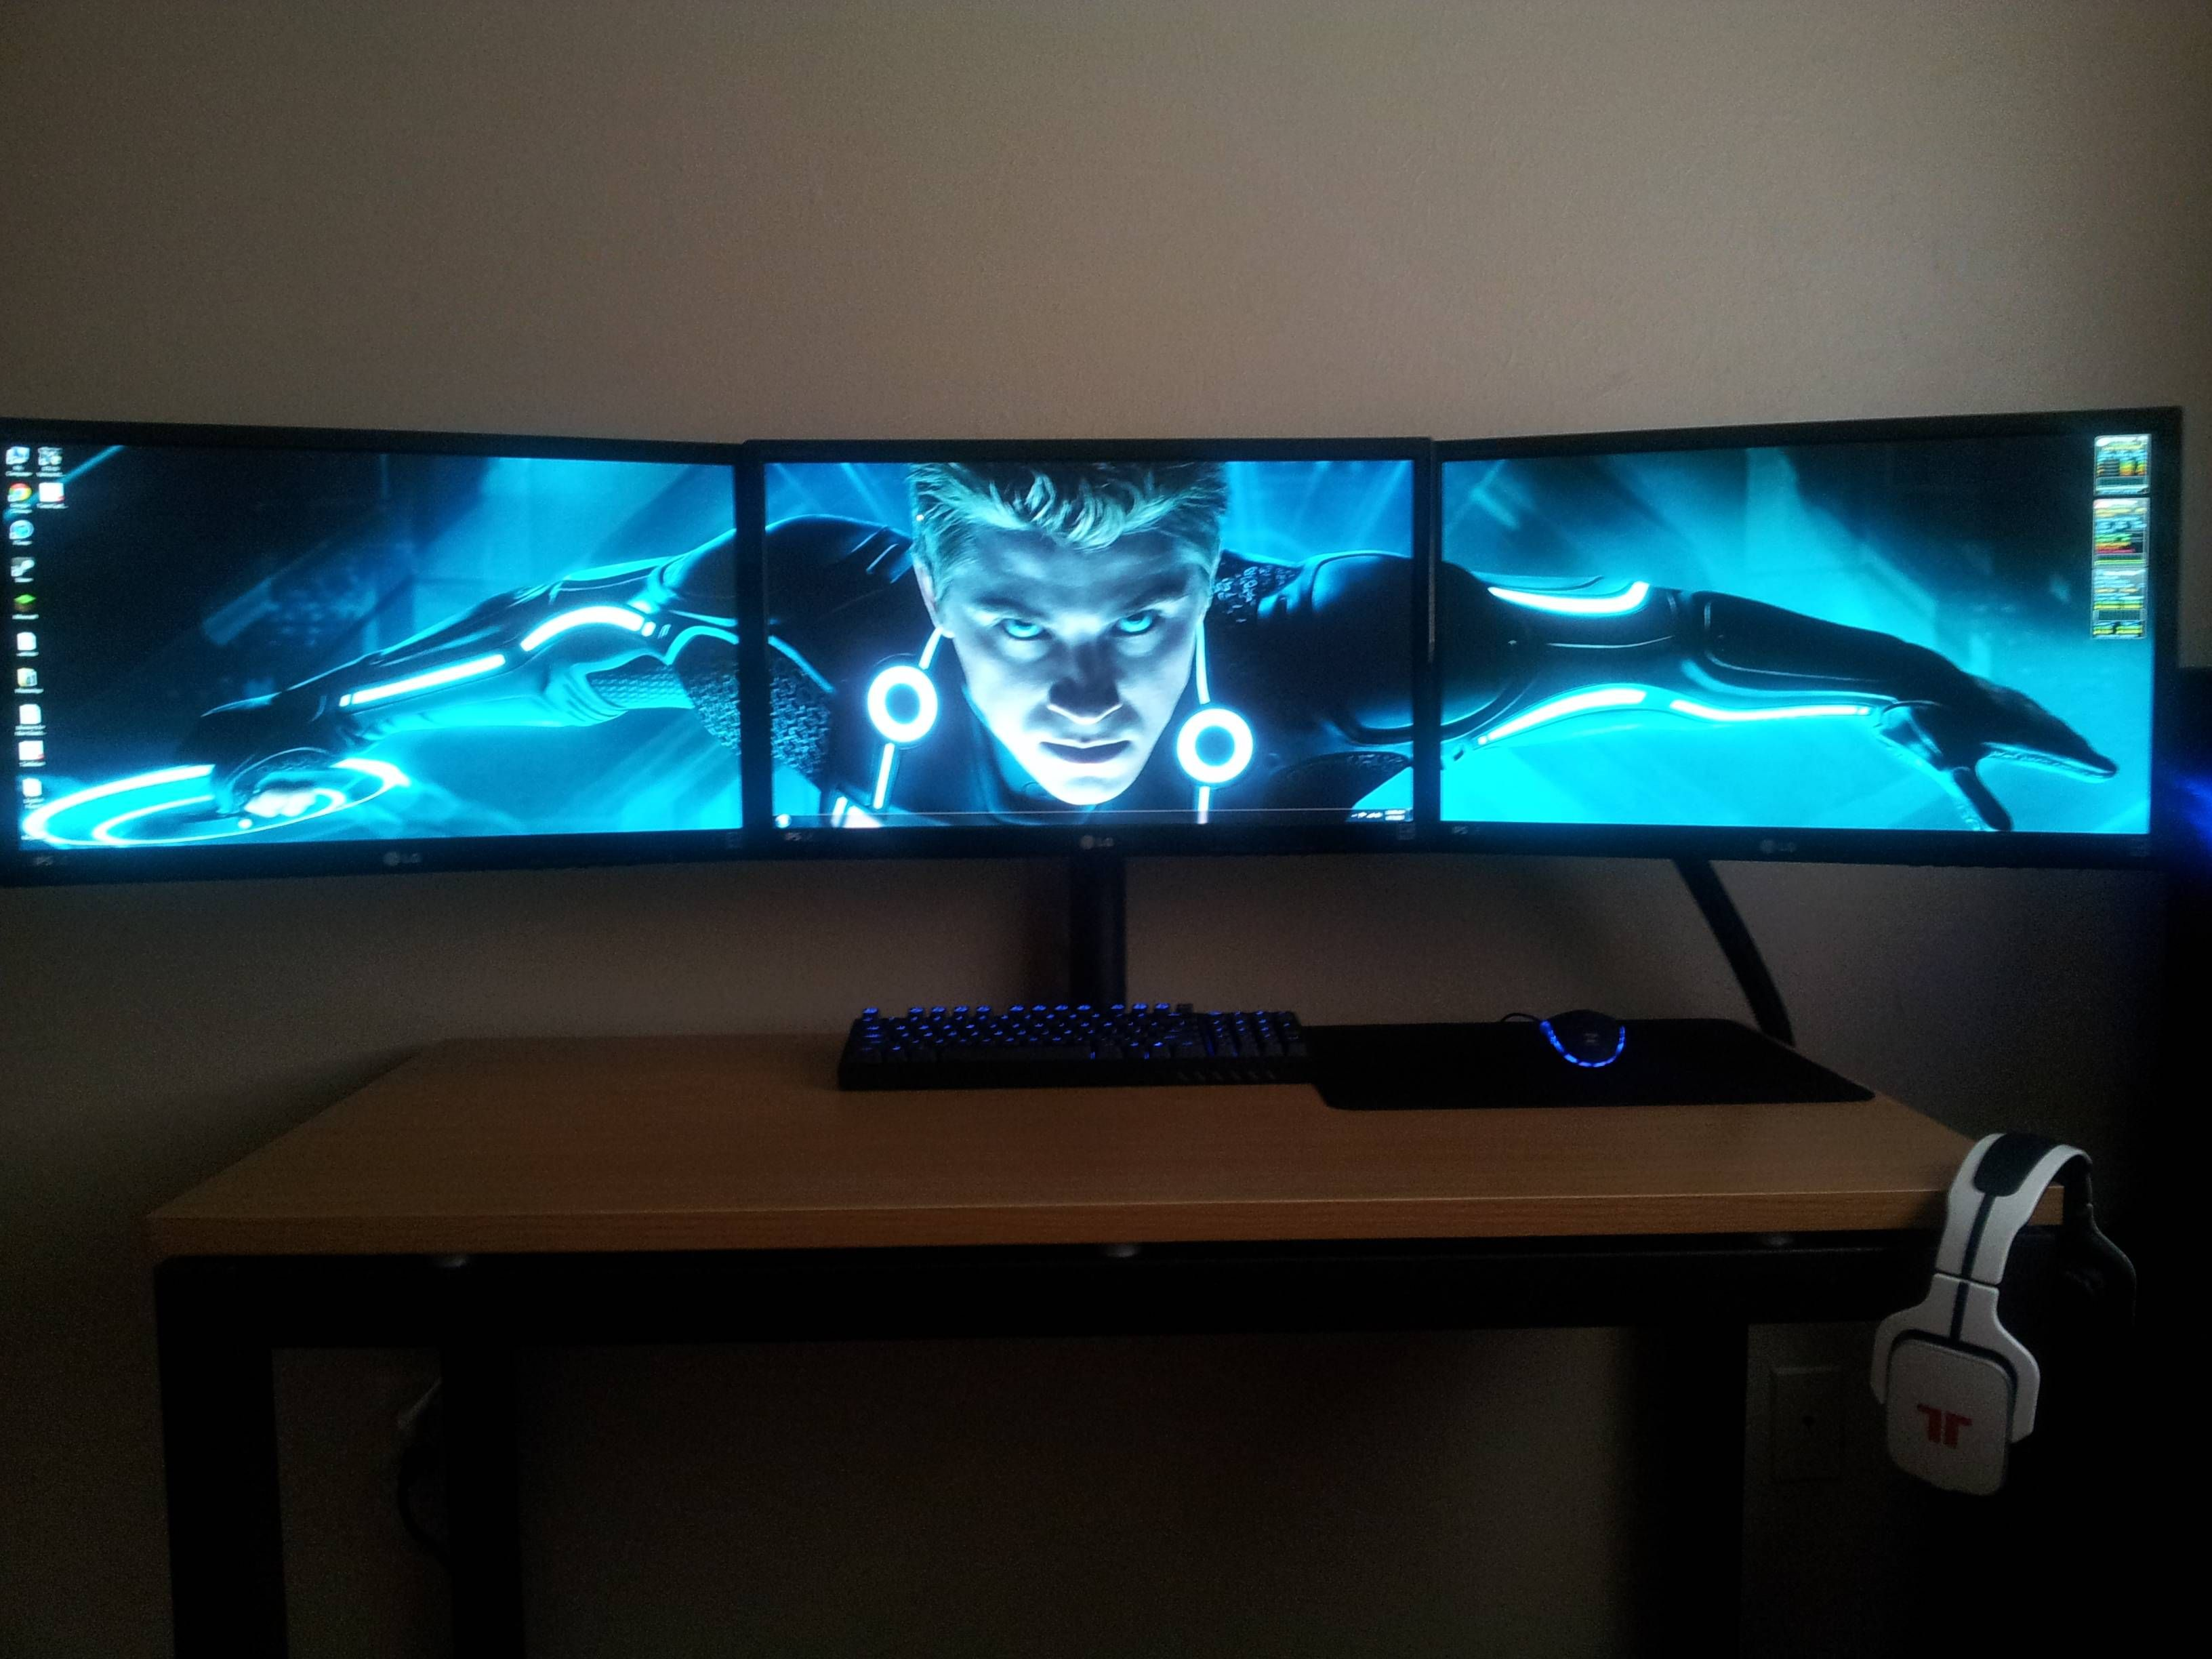 Accessories & Furniture,Good Looking Best Computer Setup